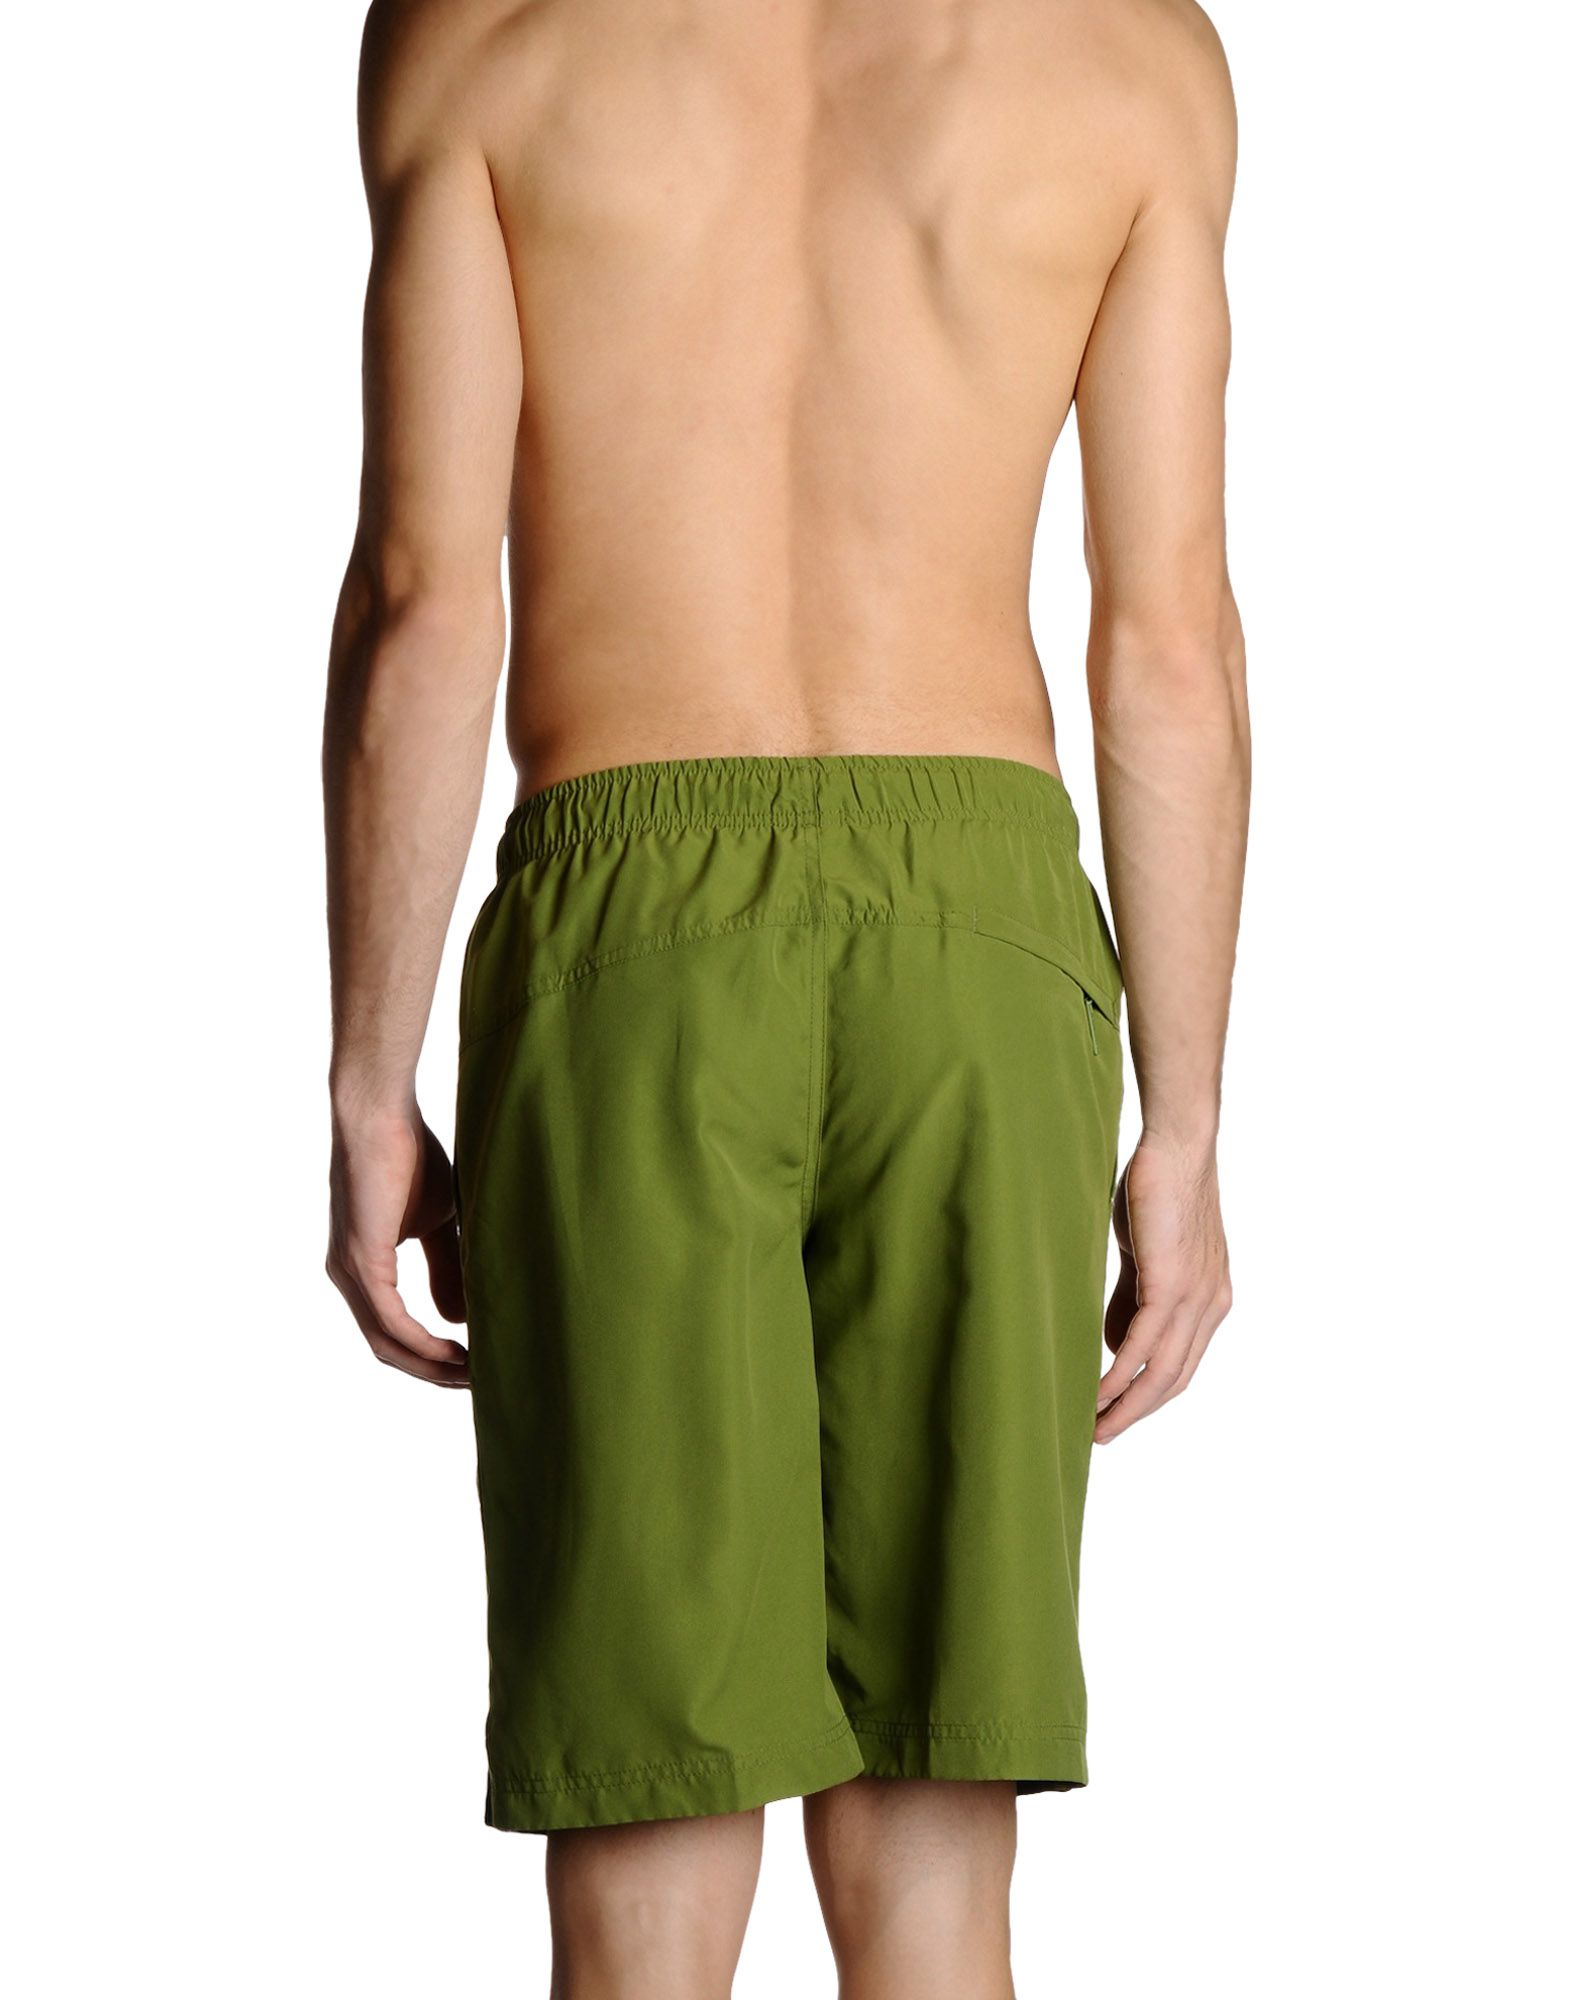 calvin klein swim trunks in green for men lyst. Black Bedroom Furniture Sets. Home Design Ideas